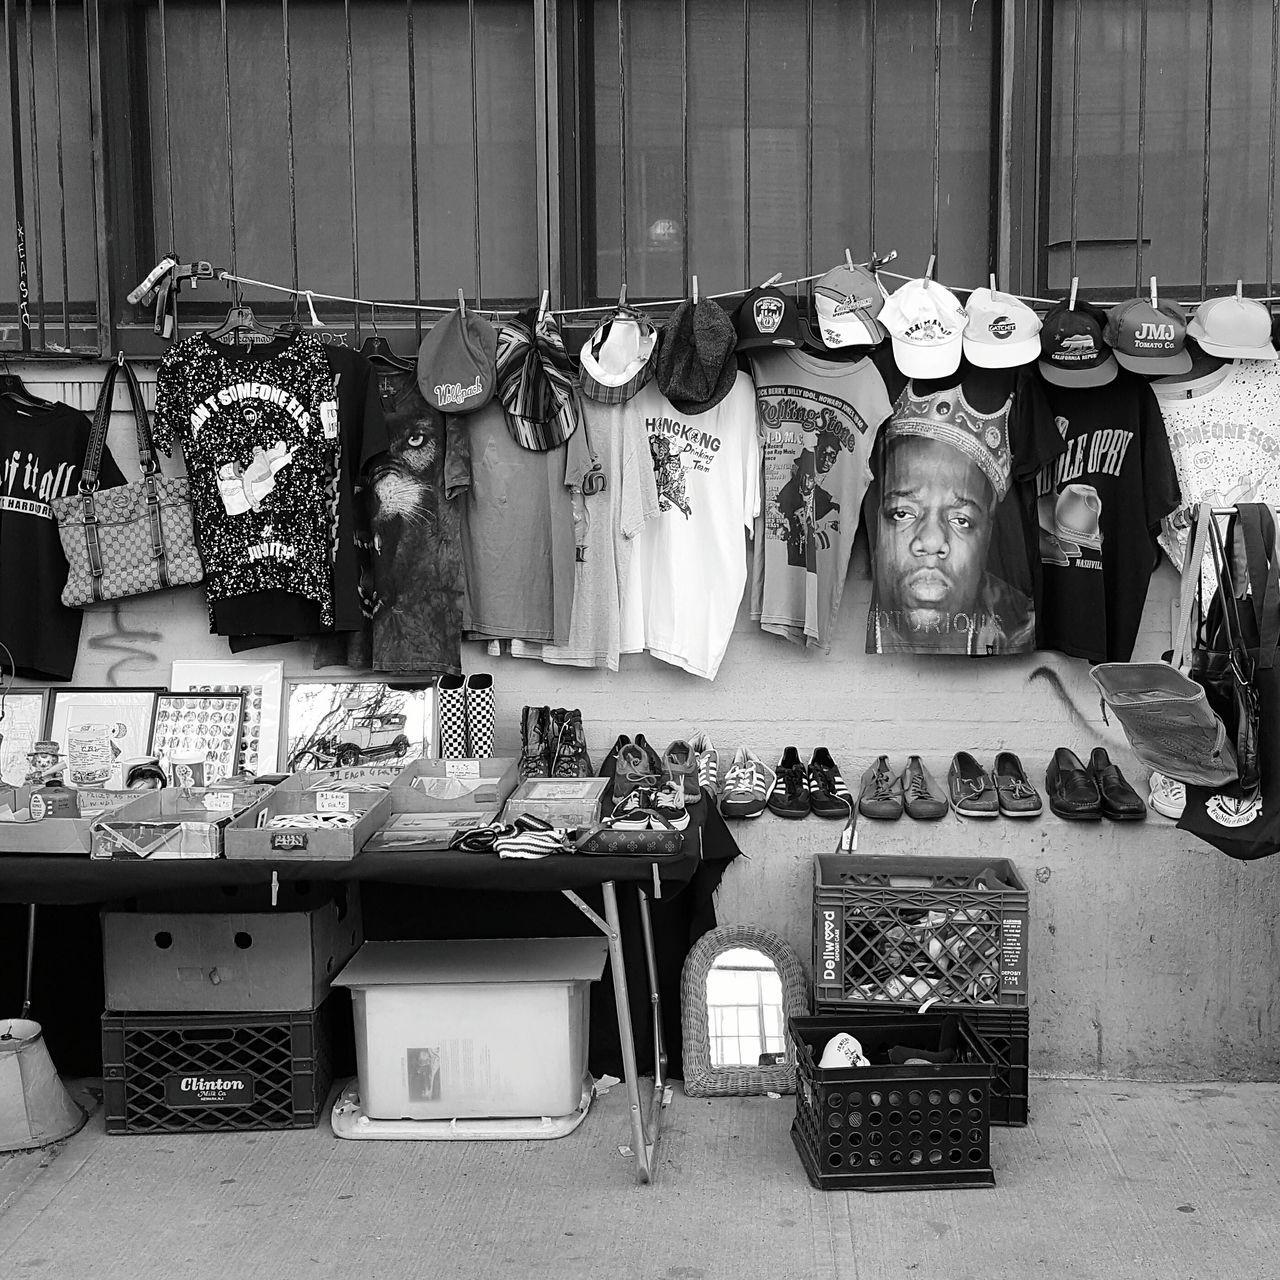 Sidewalk sale. NYC Photography EyeEmBestPics Streetphotography NYC Street Photography Streetartistry EyeEyem Mobile Photography Shootermag_usa Eeyem Photography Black & White Bnw_captures Bnw_friday_eyeemchallenge Urban Lifestyle No People Fashion Nostalgia NYC